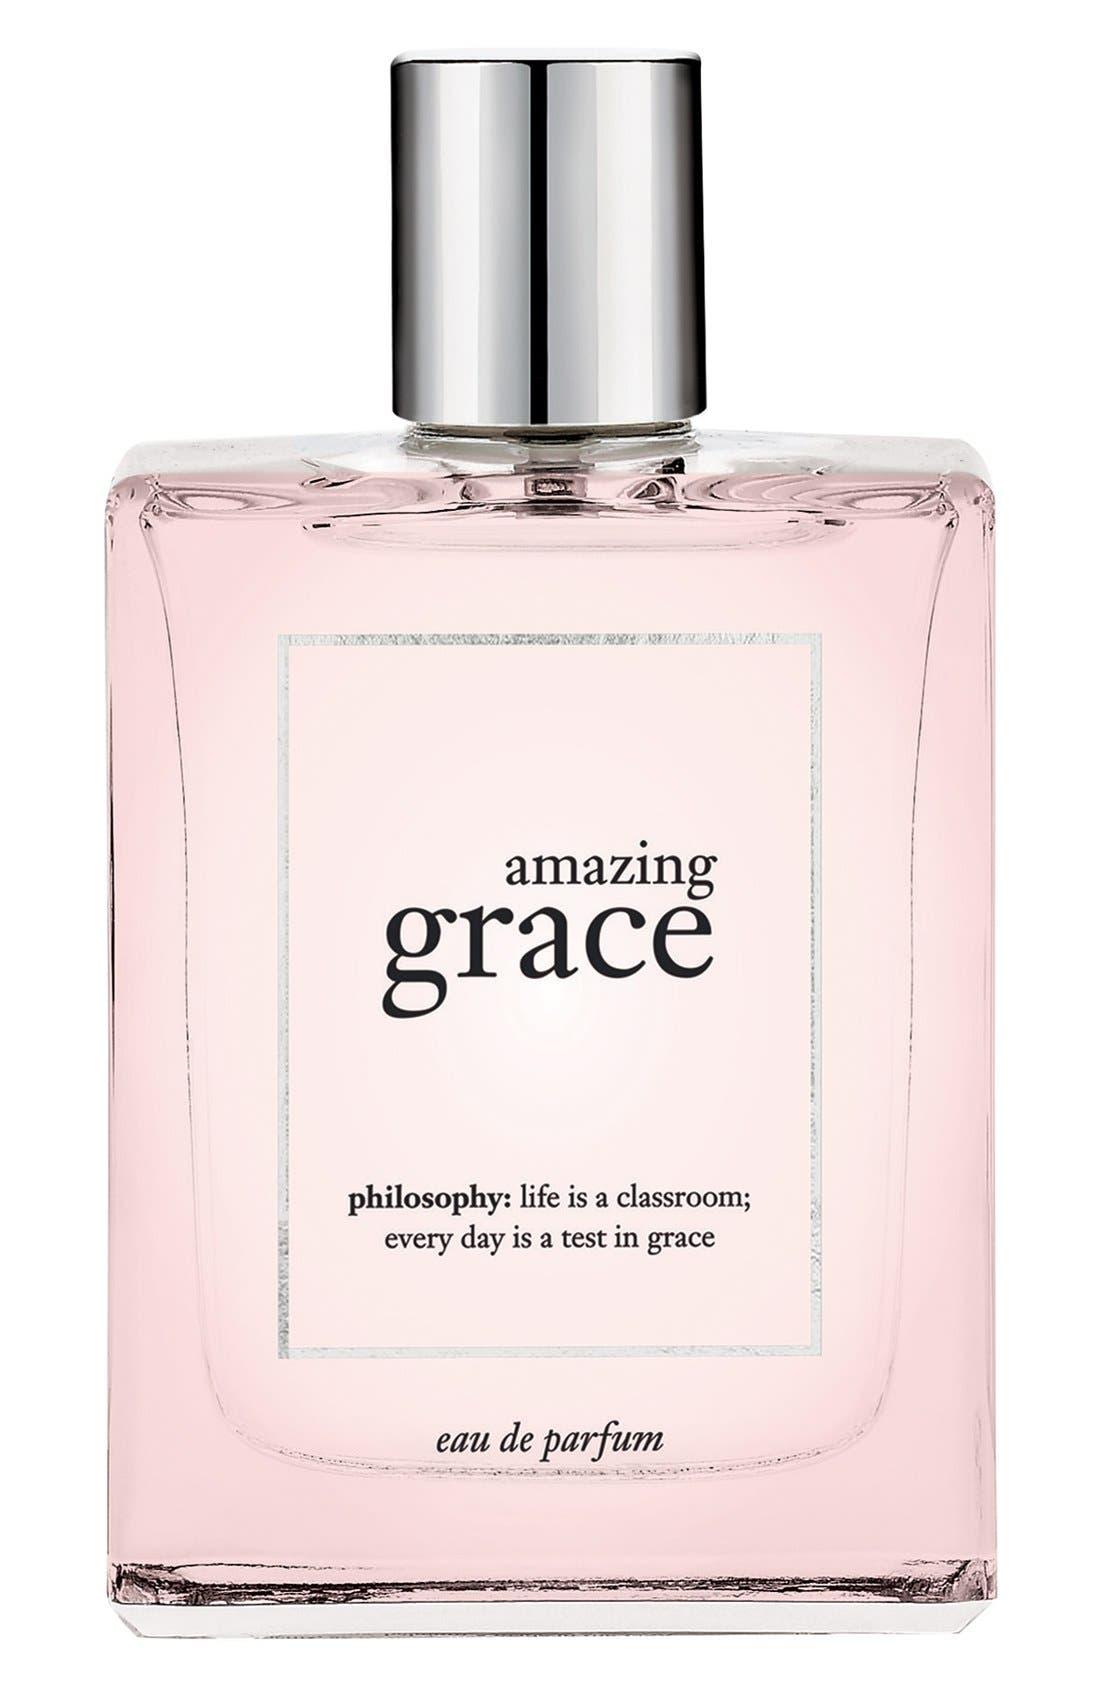 philosophy 'amazing grace' eau de parfum spray